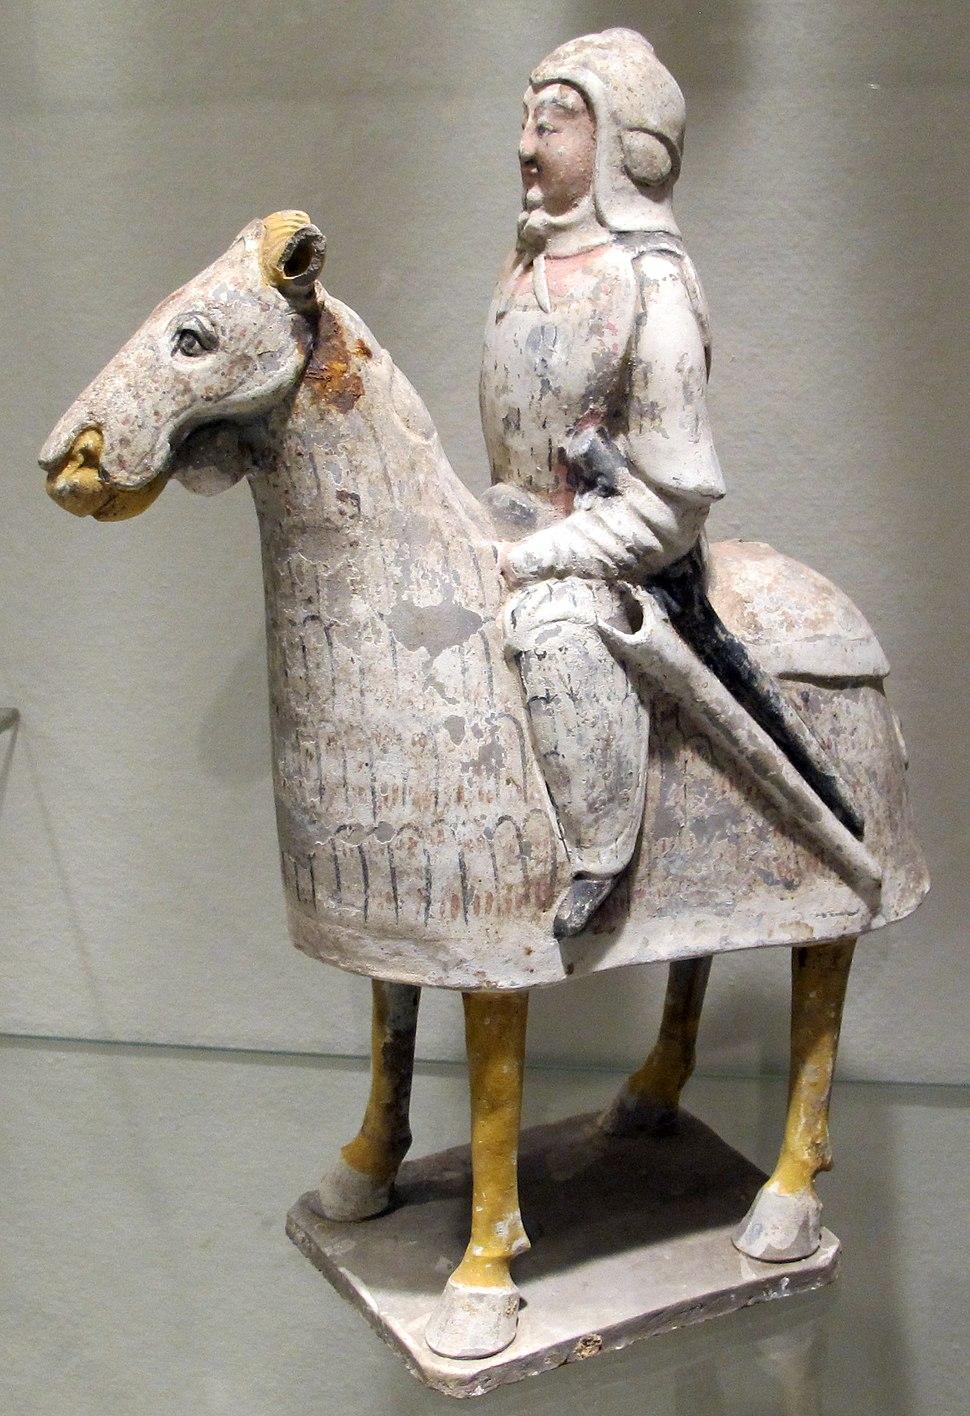 Dinastia qi del nord, guerriero a cavallo da un corredo funebre, 550-577 ca.